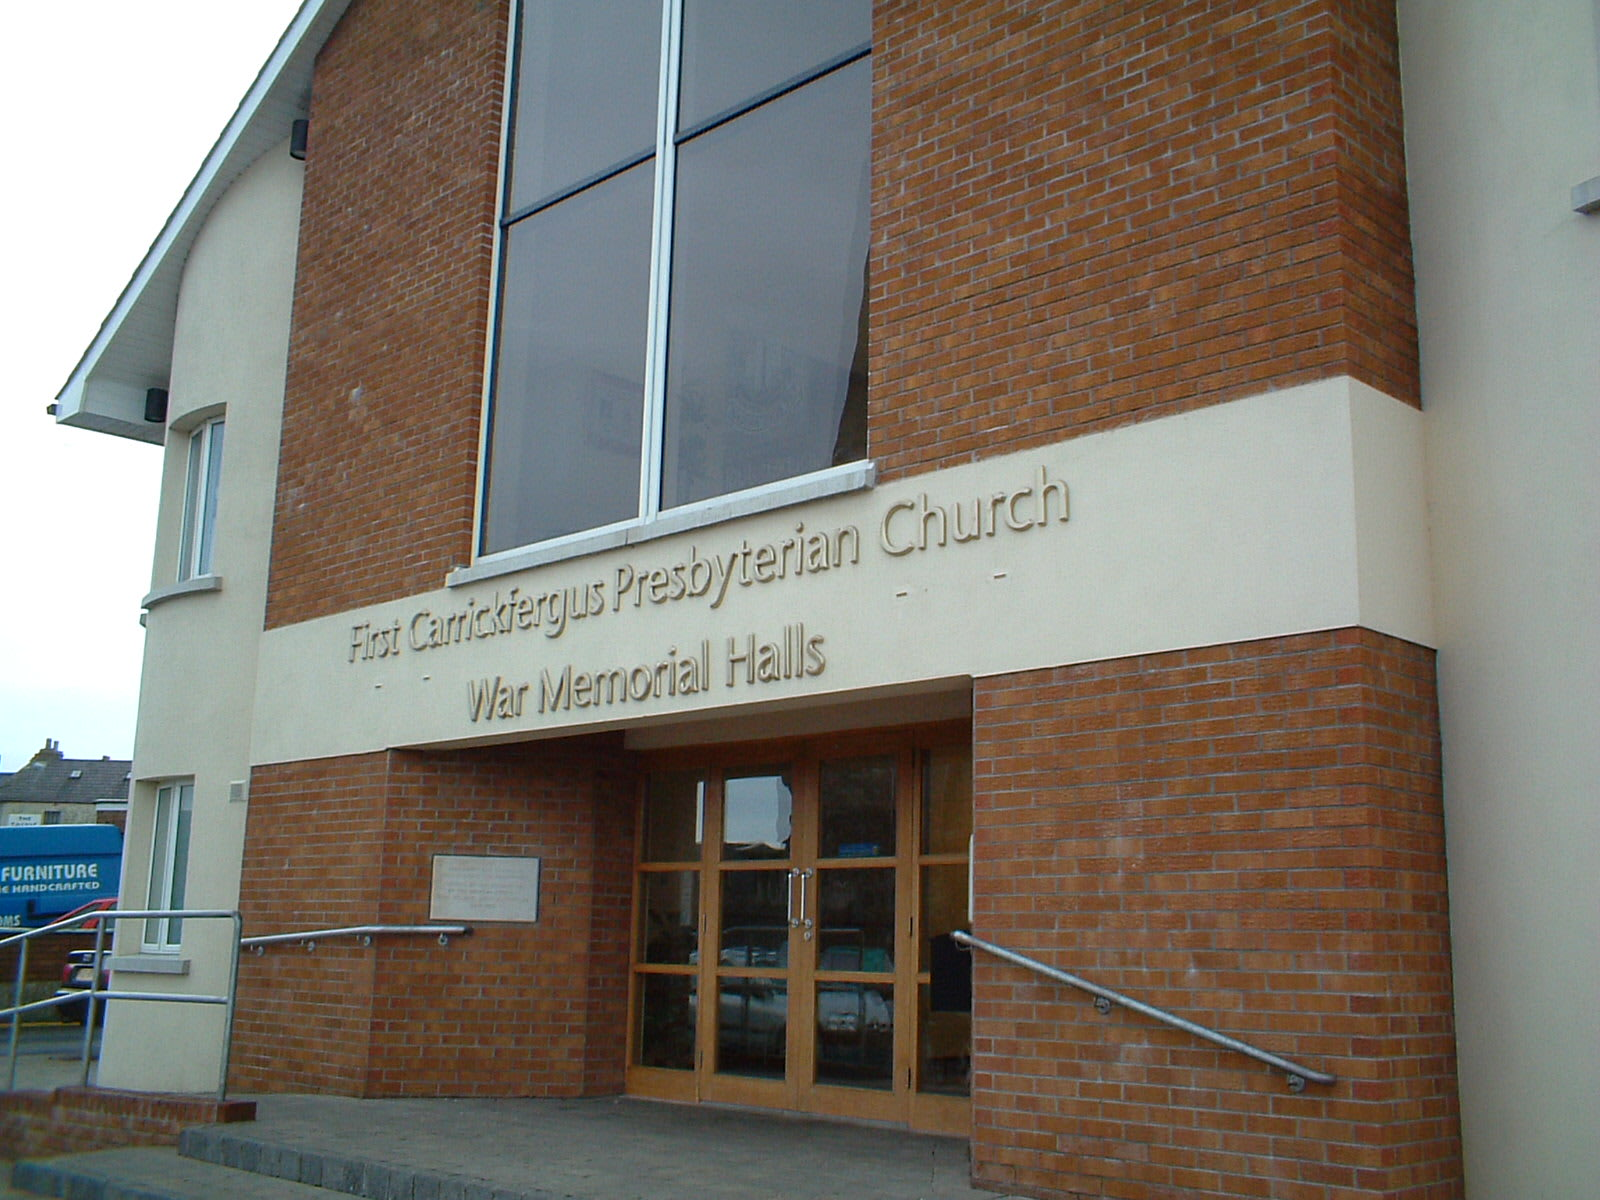 North Street First Carrick Presbyterian Church   North Street, Carrickfergus BT38 7AE   +44 28 9336 1480